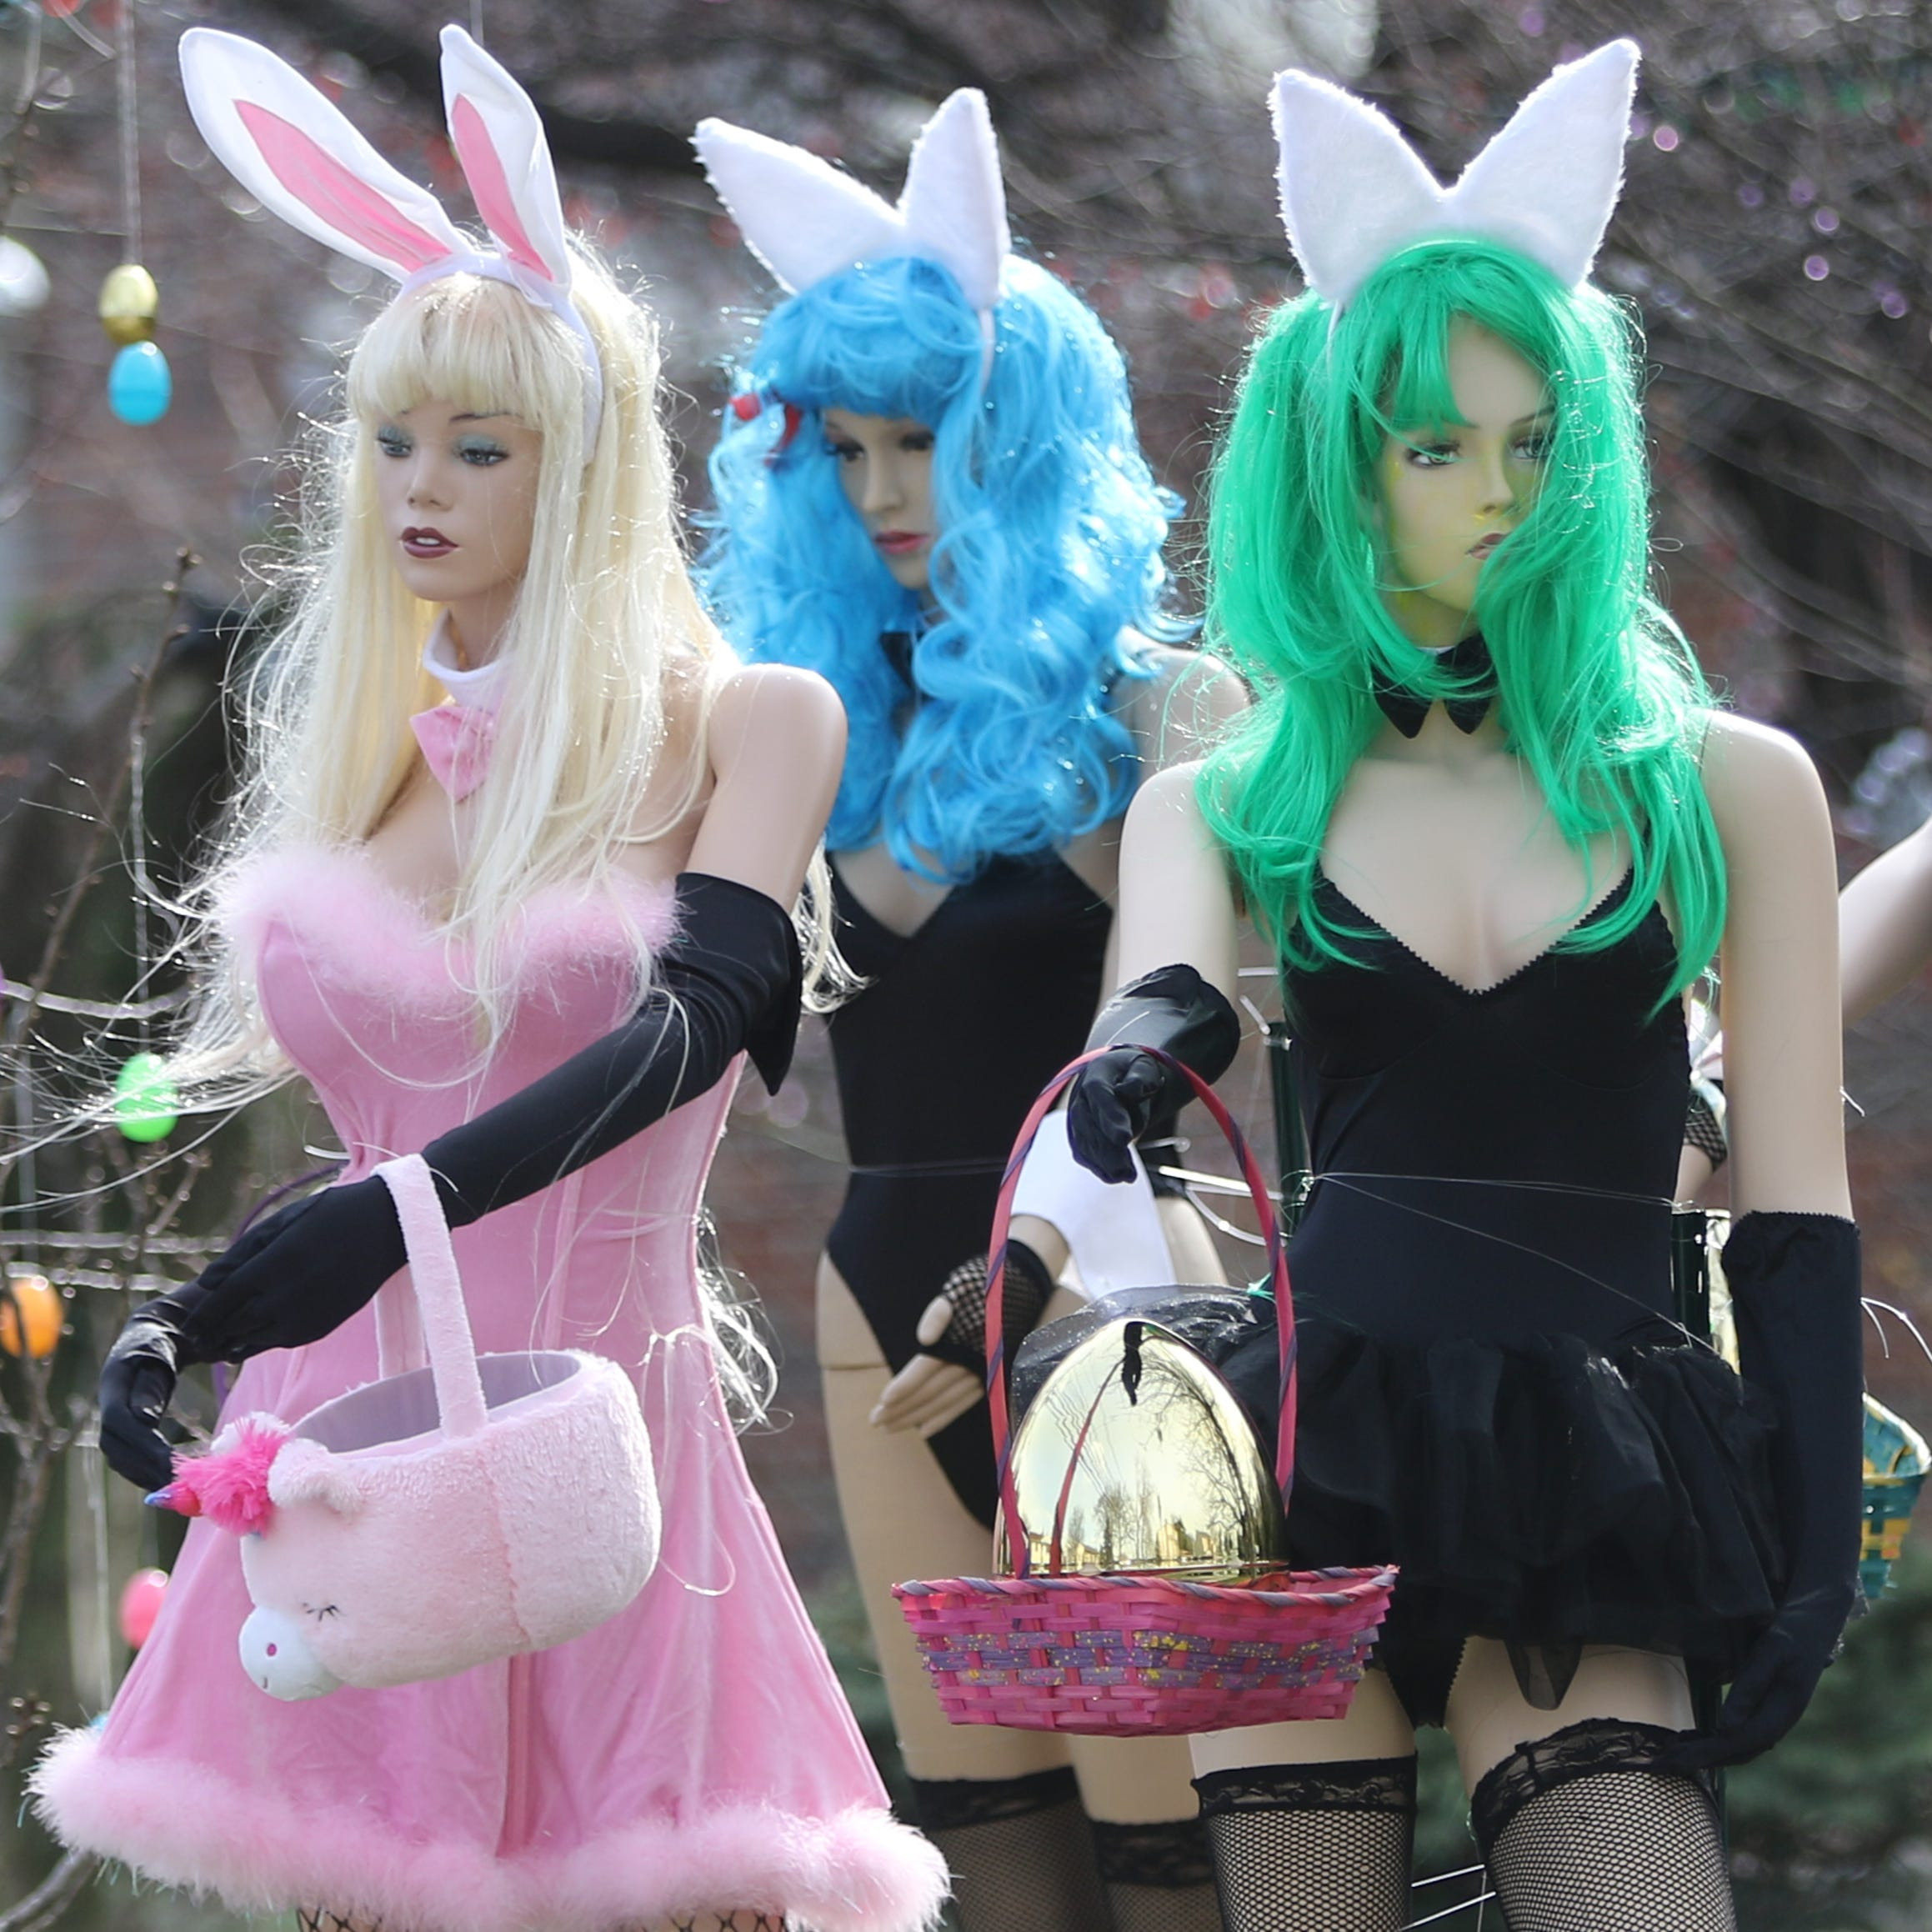 Sexy Easter mannequin display earns Clifton dentist 'Hugh Hefner' nickname